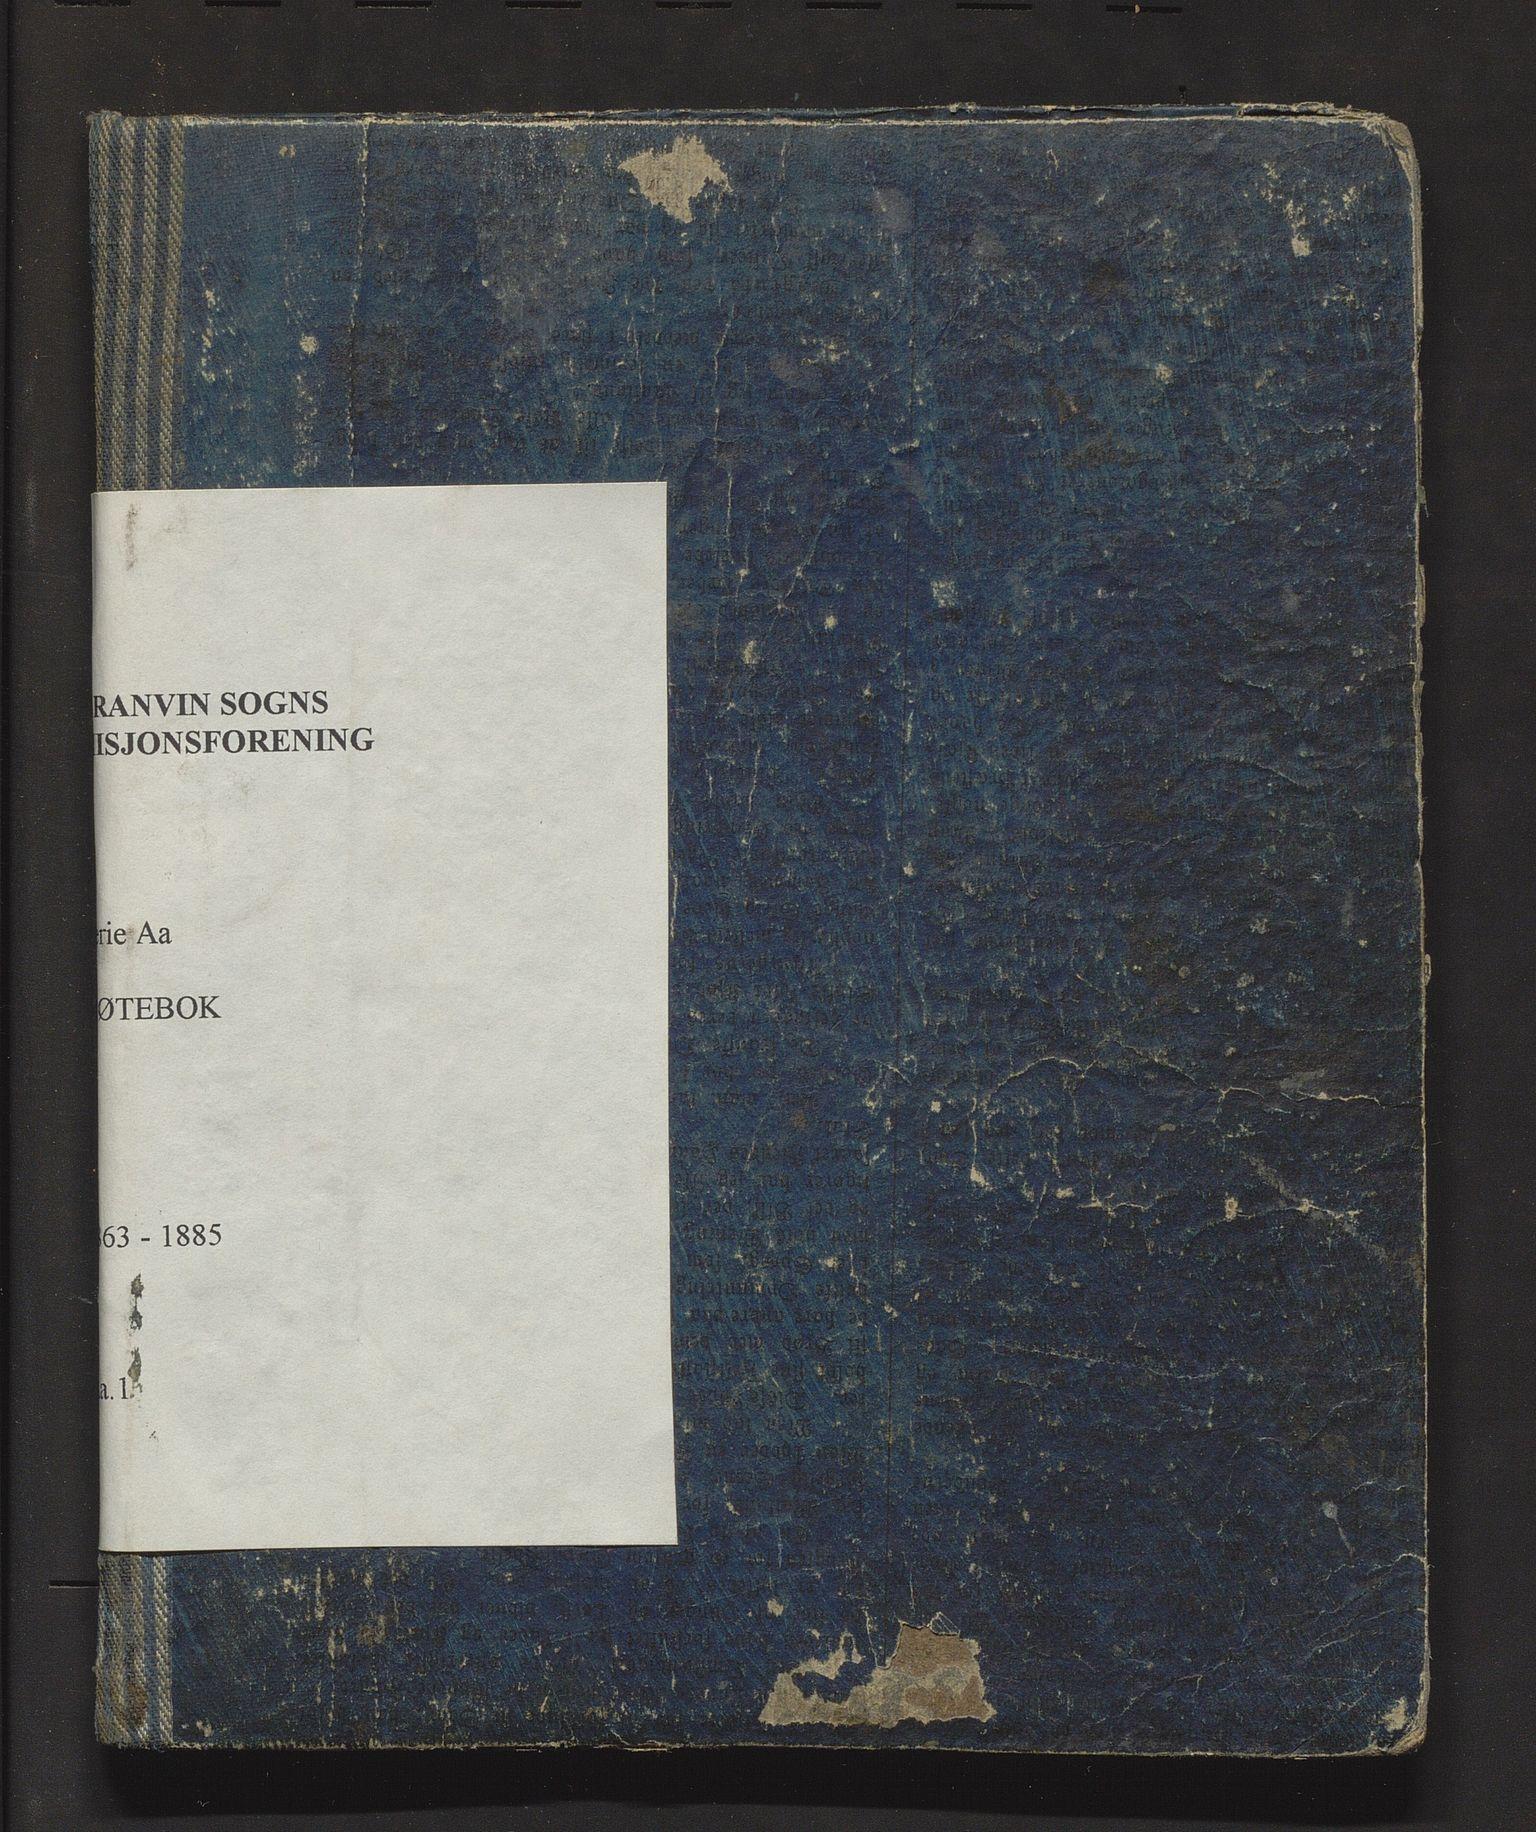 IKAH, Granvin sogns misjonsforening, A/Aa/L0001: Møtebok for Granvin sogns misjonsforening, 1863-1885